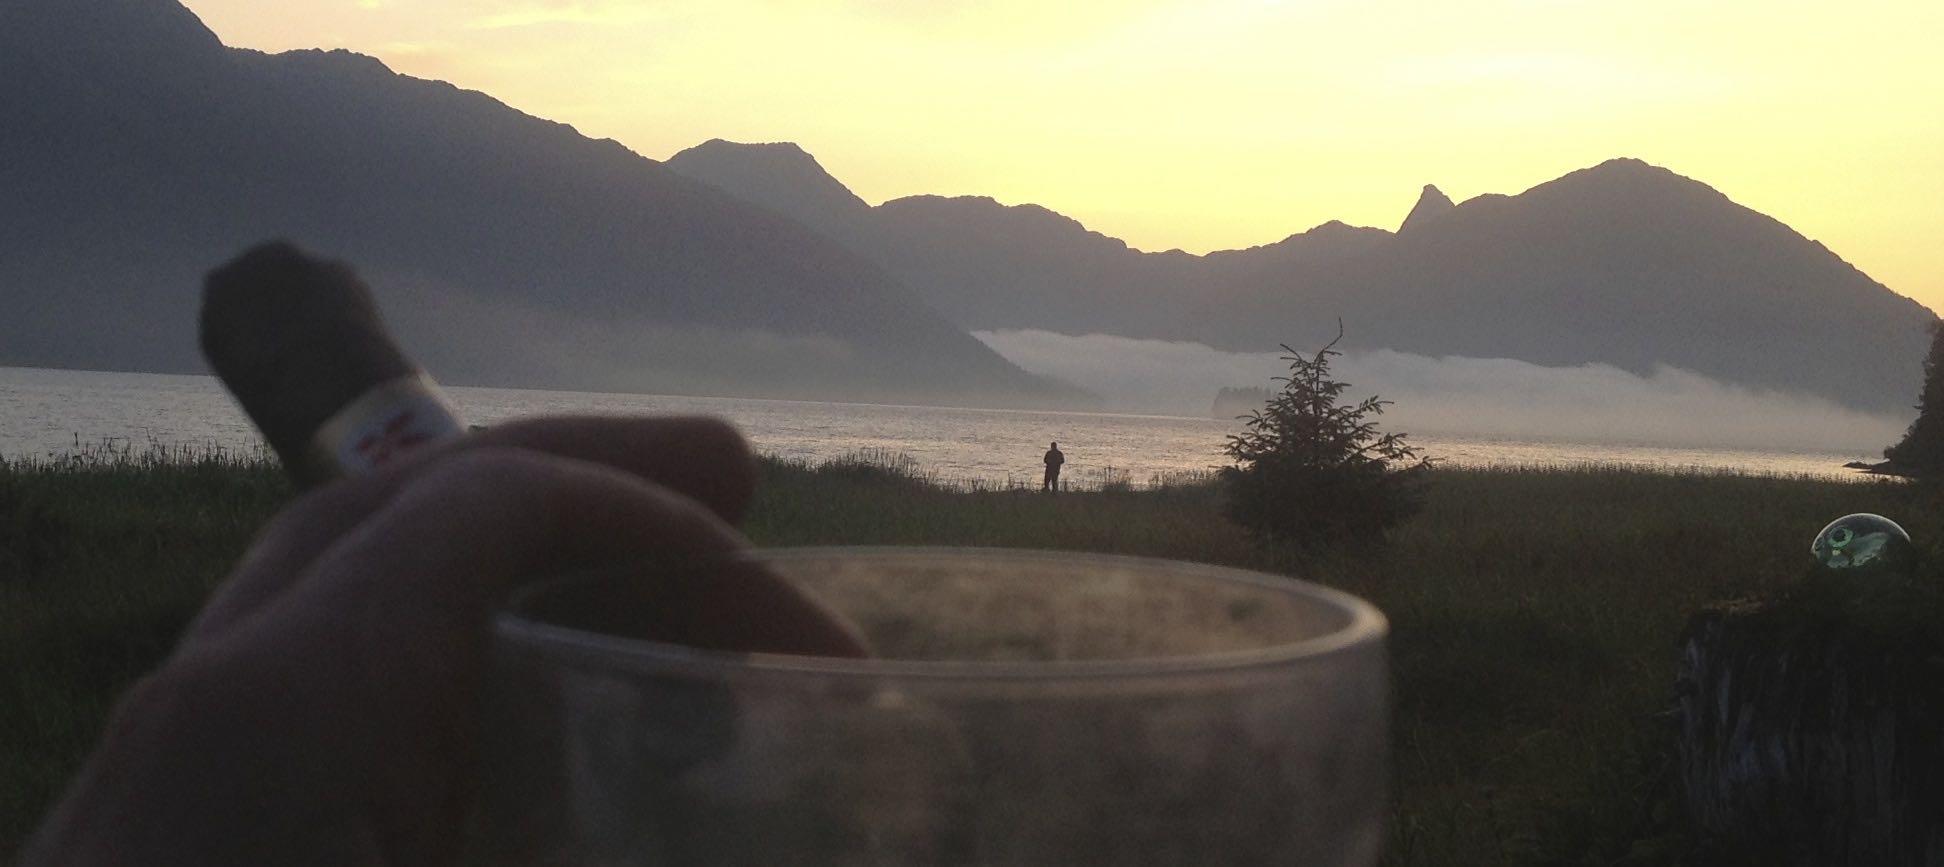 cigar-sunset-wisky.jpg